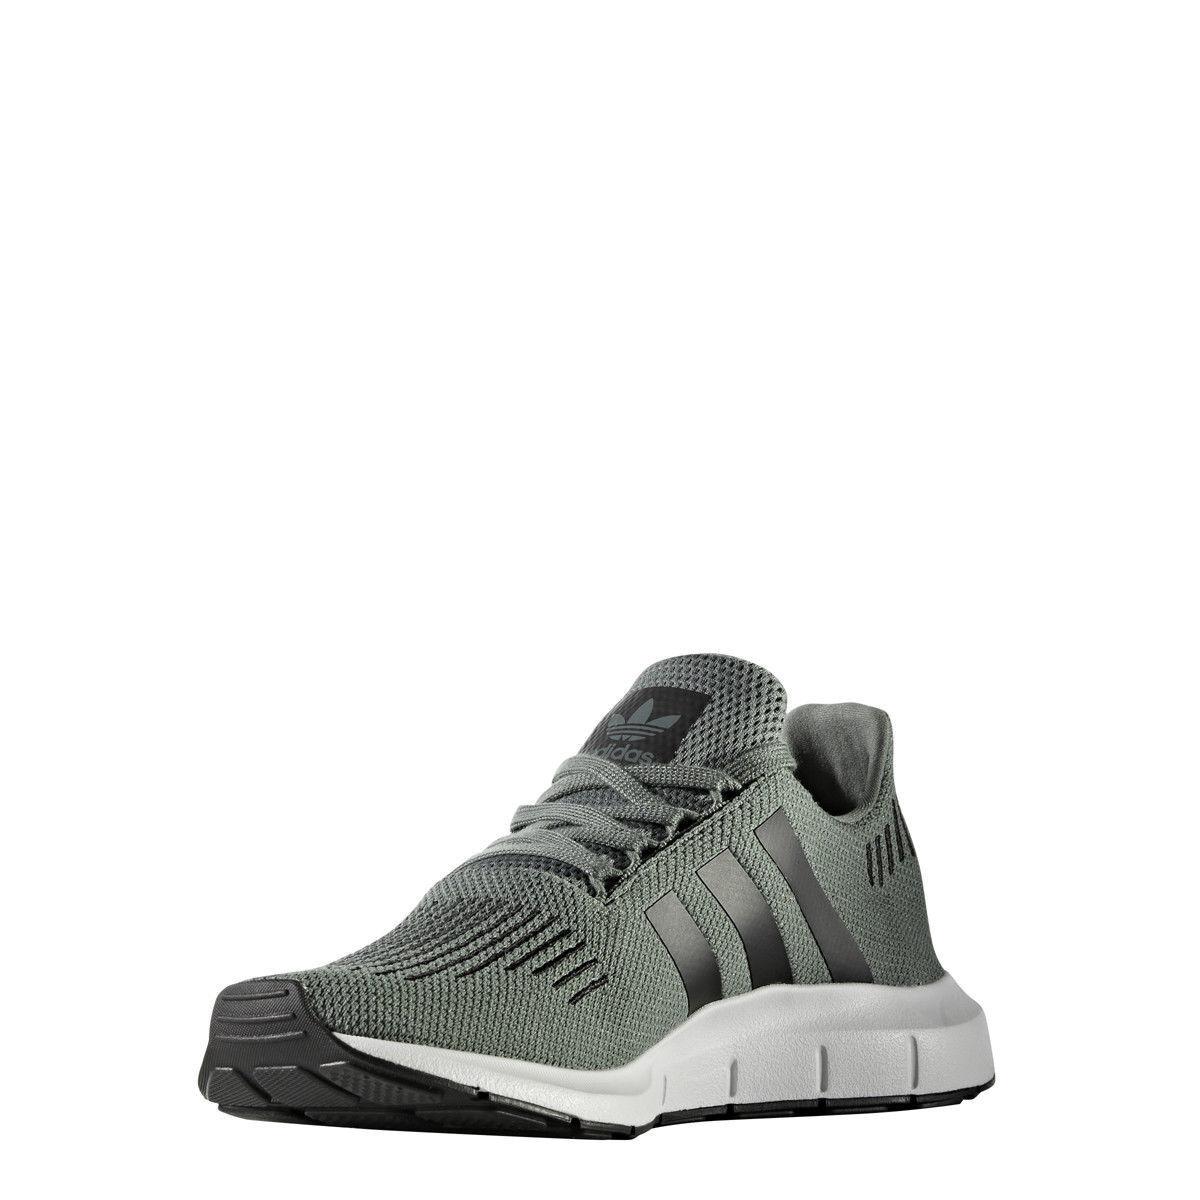 New adidas swift run mens shoes cg4115 cargo green metallic Knit running sneaker